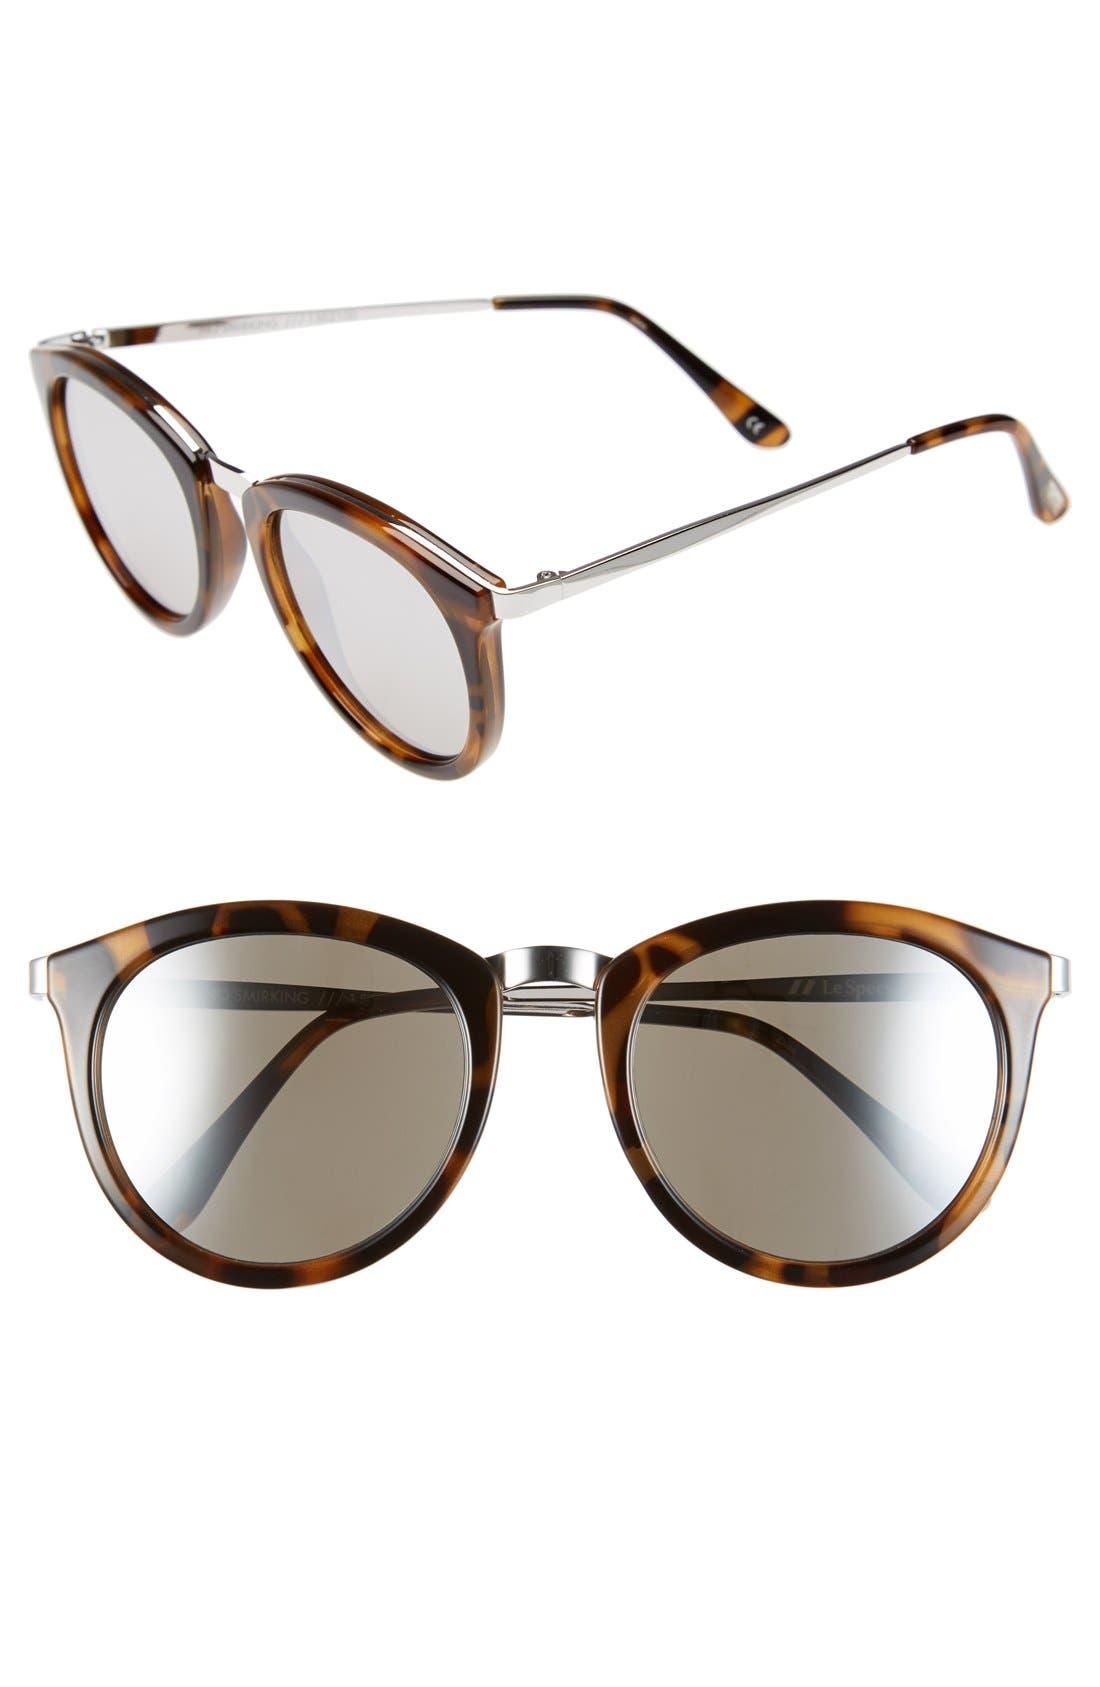 Main Image - Le Specs 'No Smirking' 50mm Round Sunglasses